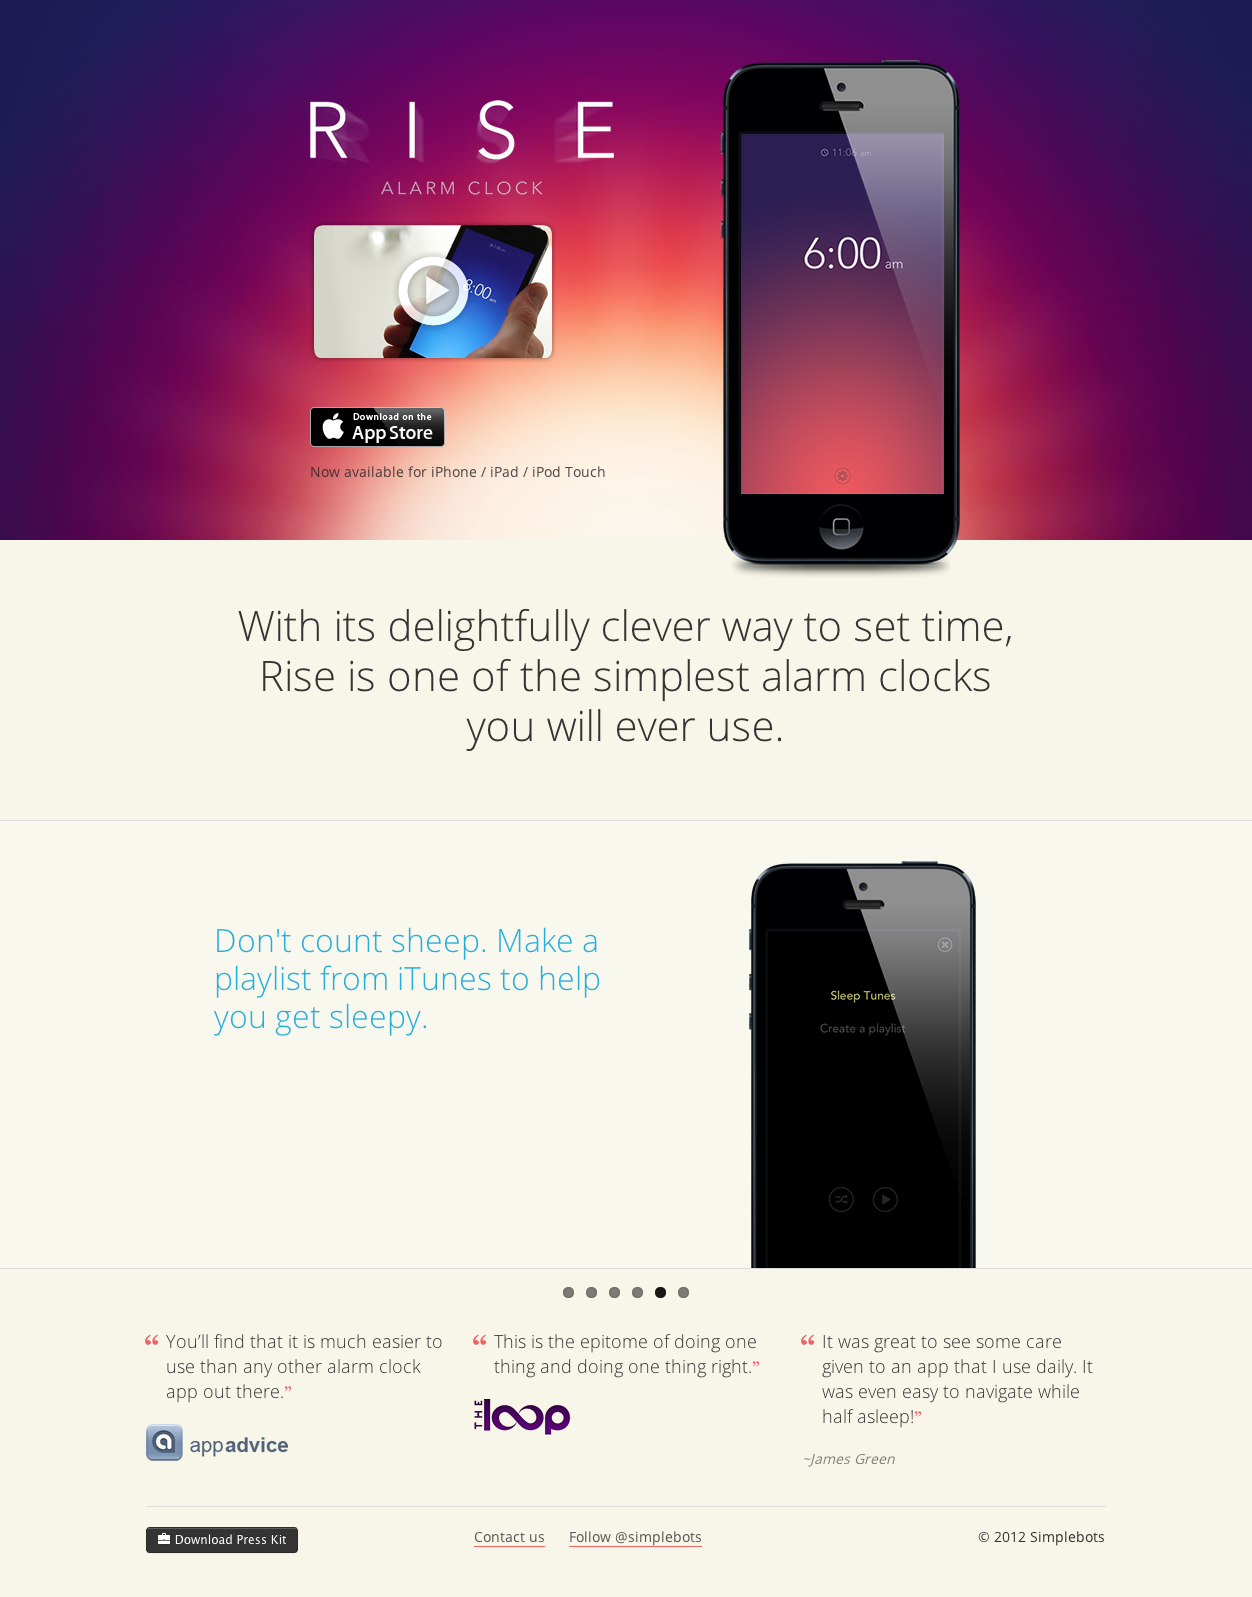 colors | WEB | Web design, Web design inspiration, News web